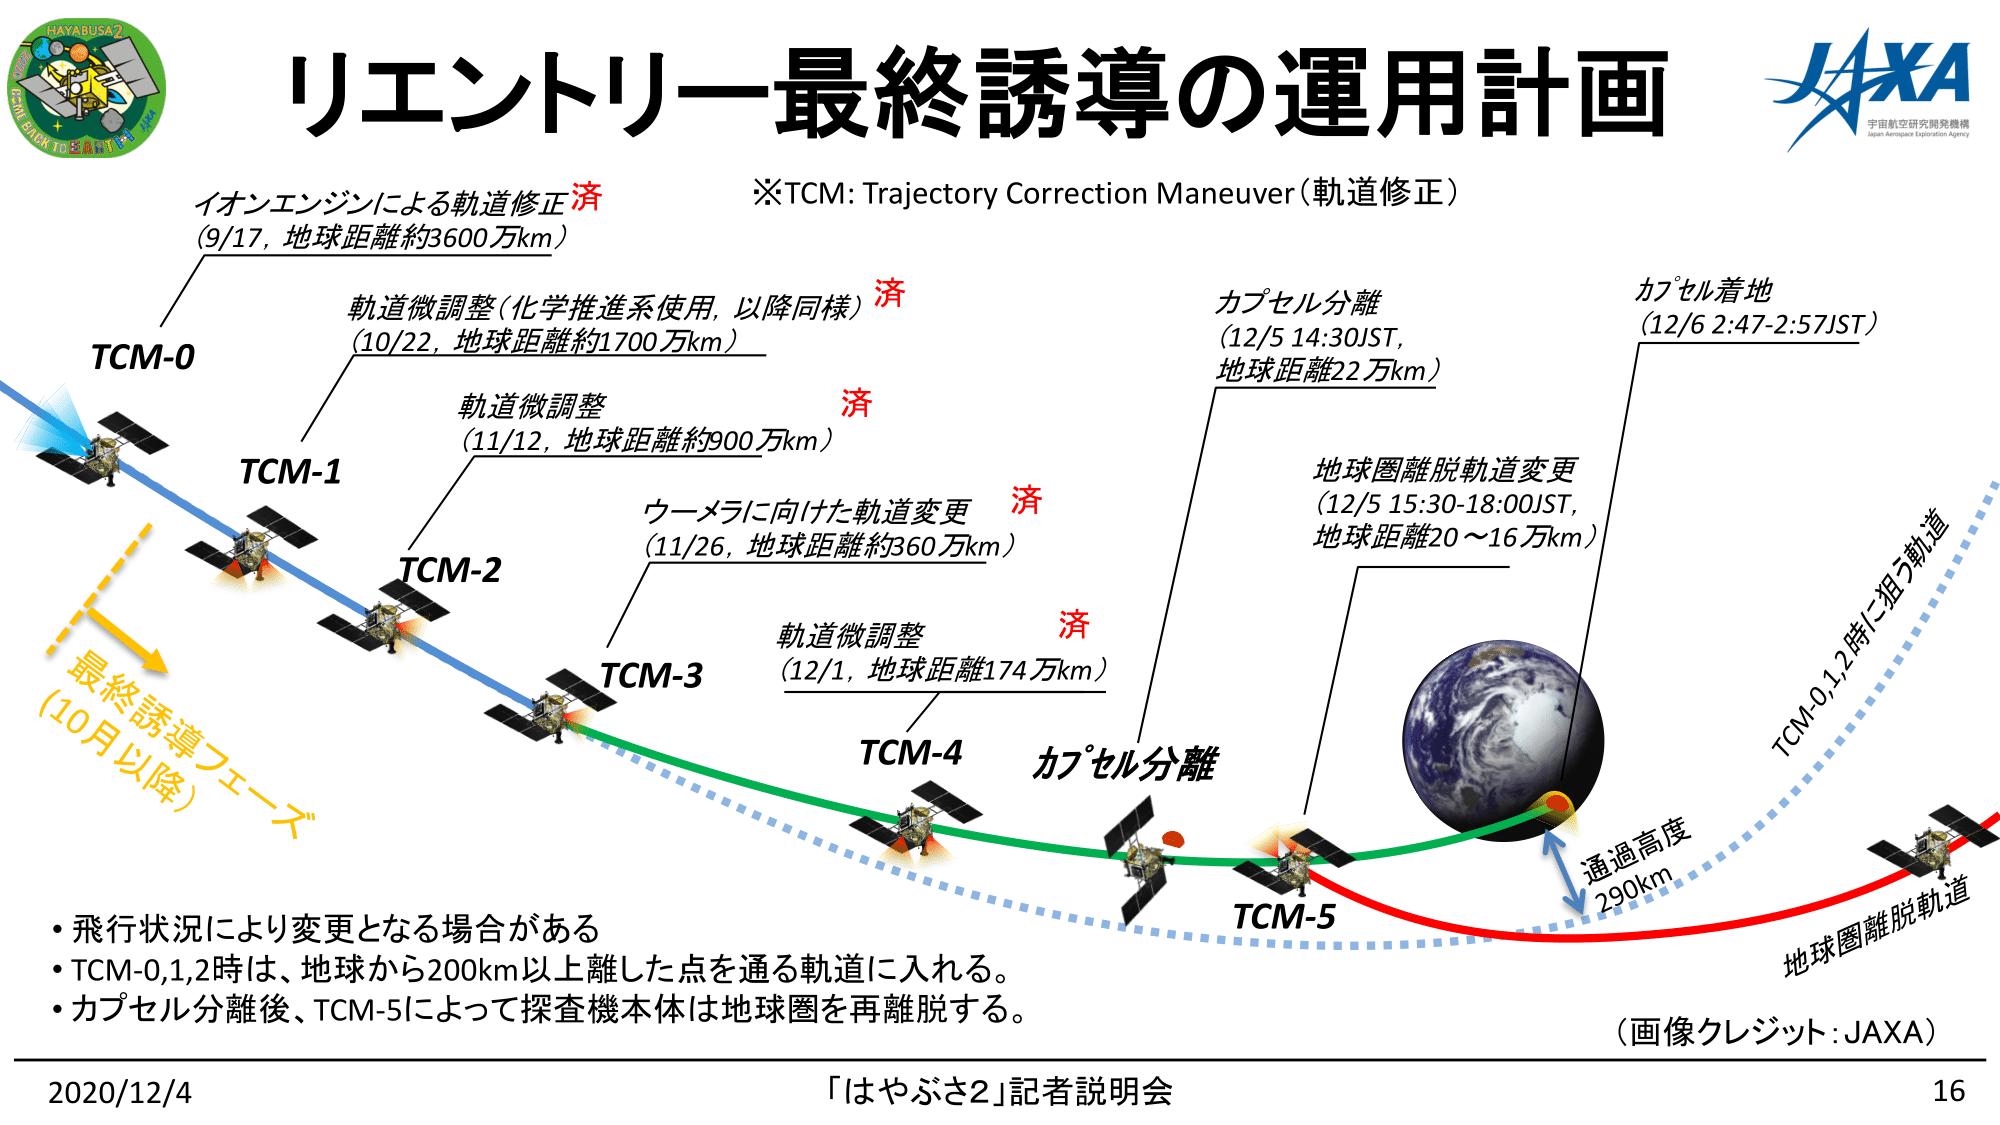 f:id:Imamura:20201204153911p:plain